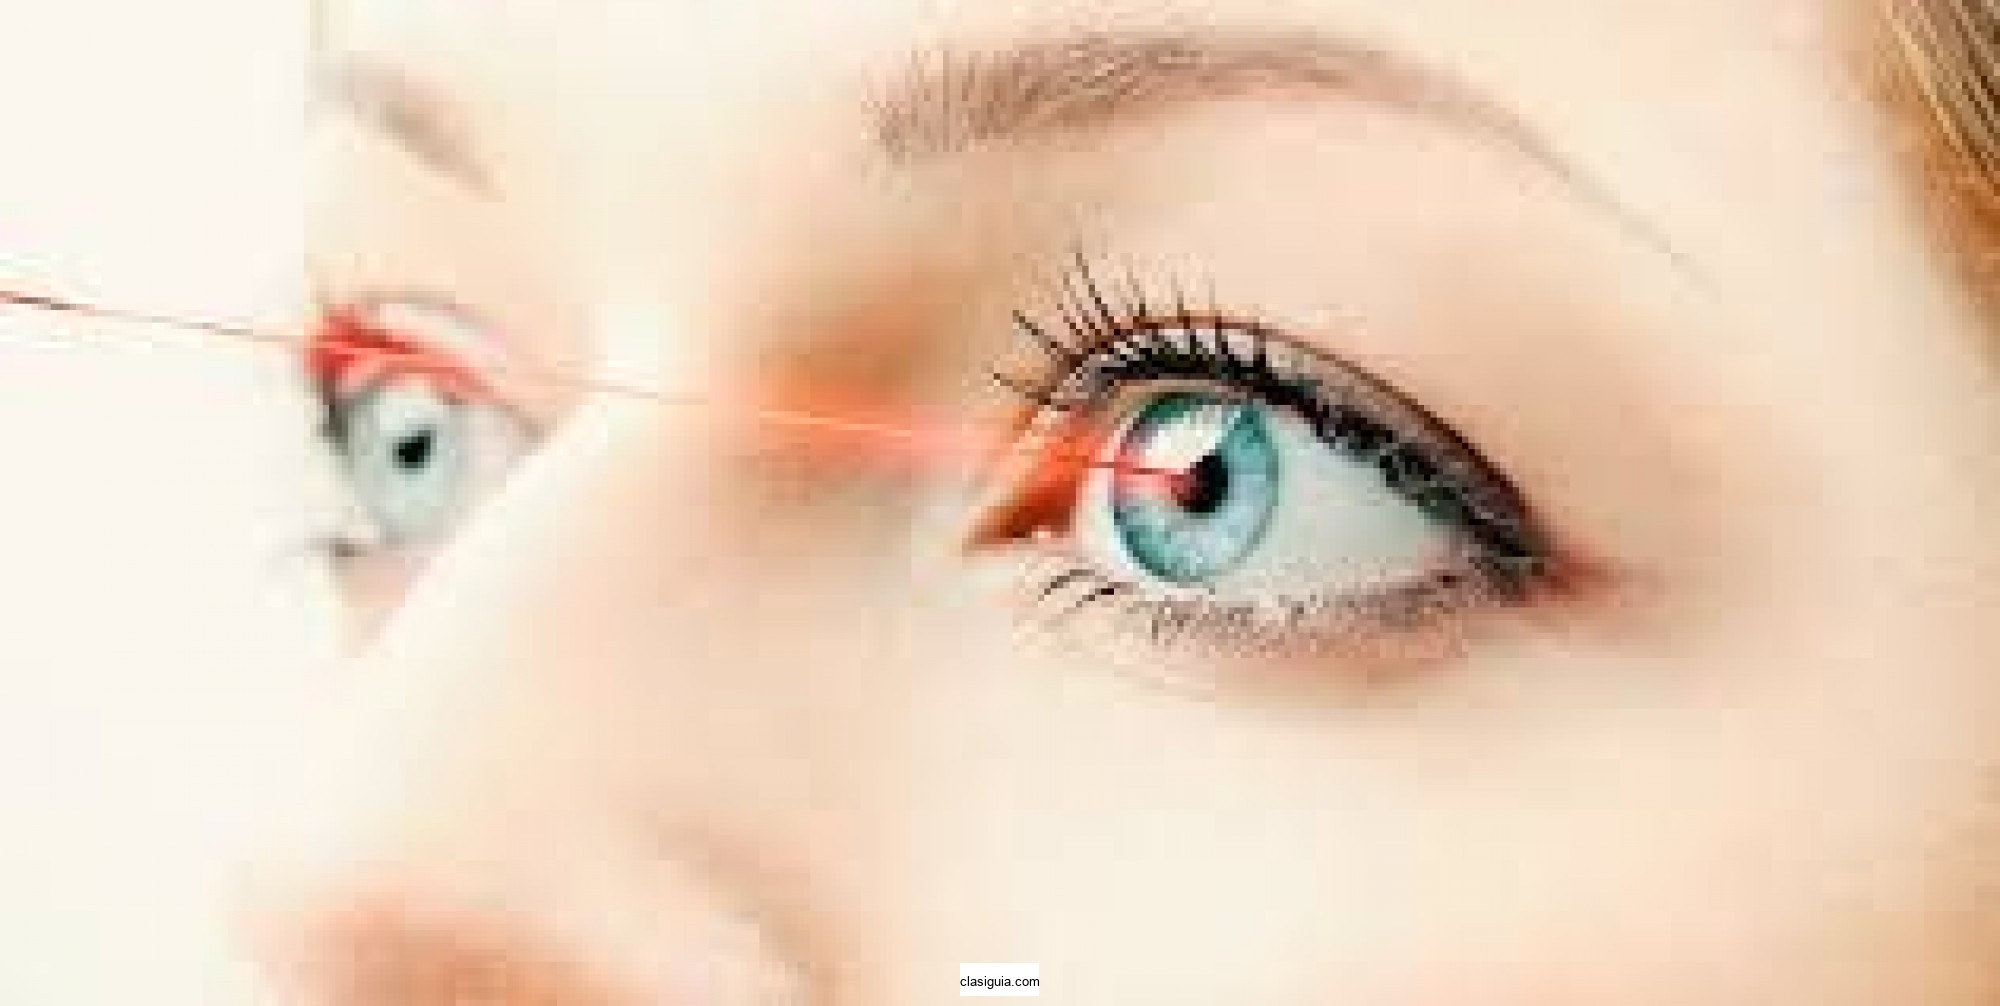 Consulta y Cirugia Catarata y Retina Diabetica